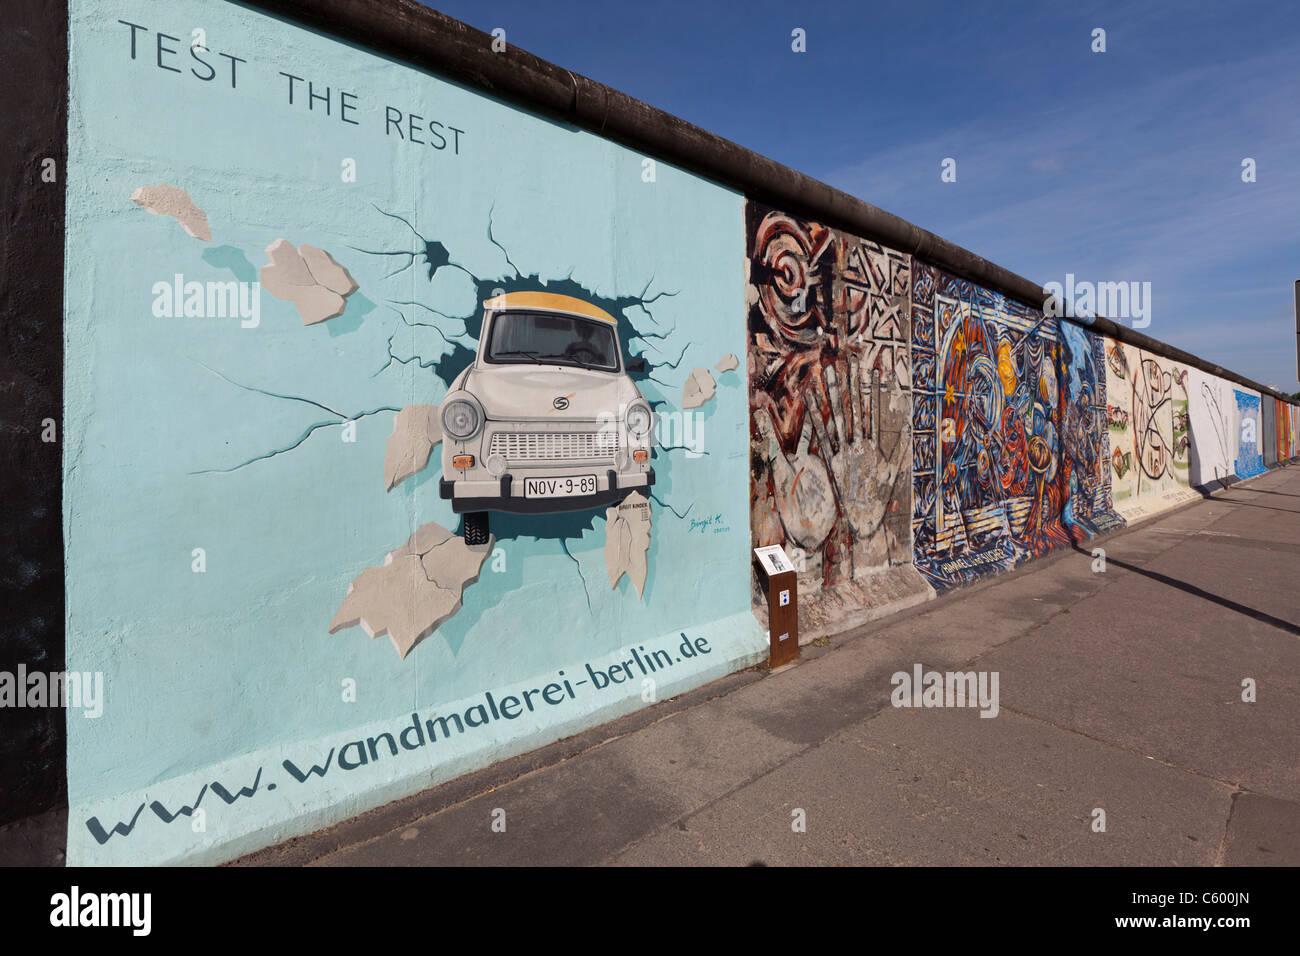 Mural de Berlín, East Side Gallery, Berlin, Alemania Imagen De Stock